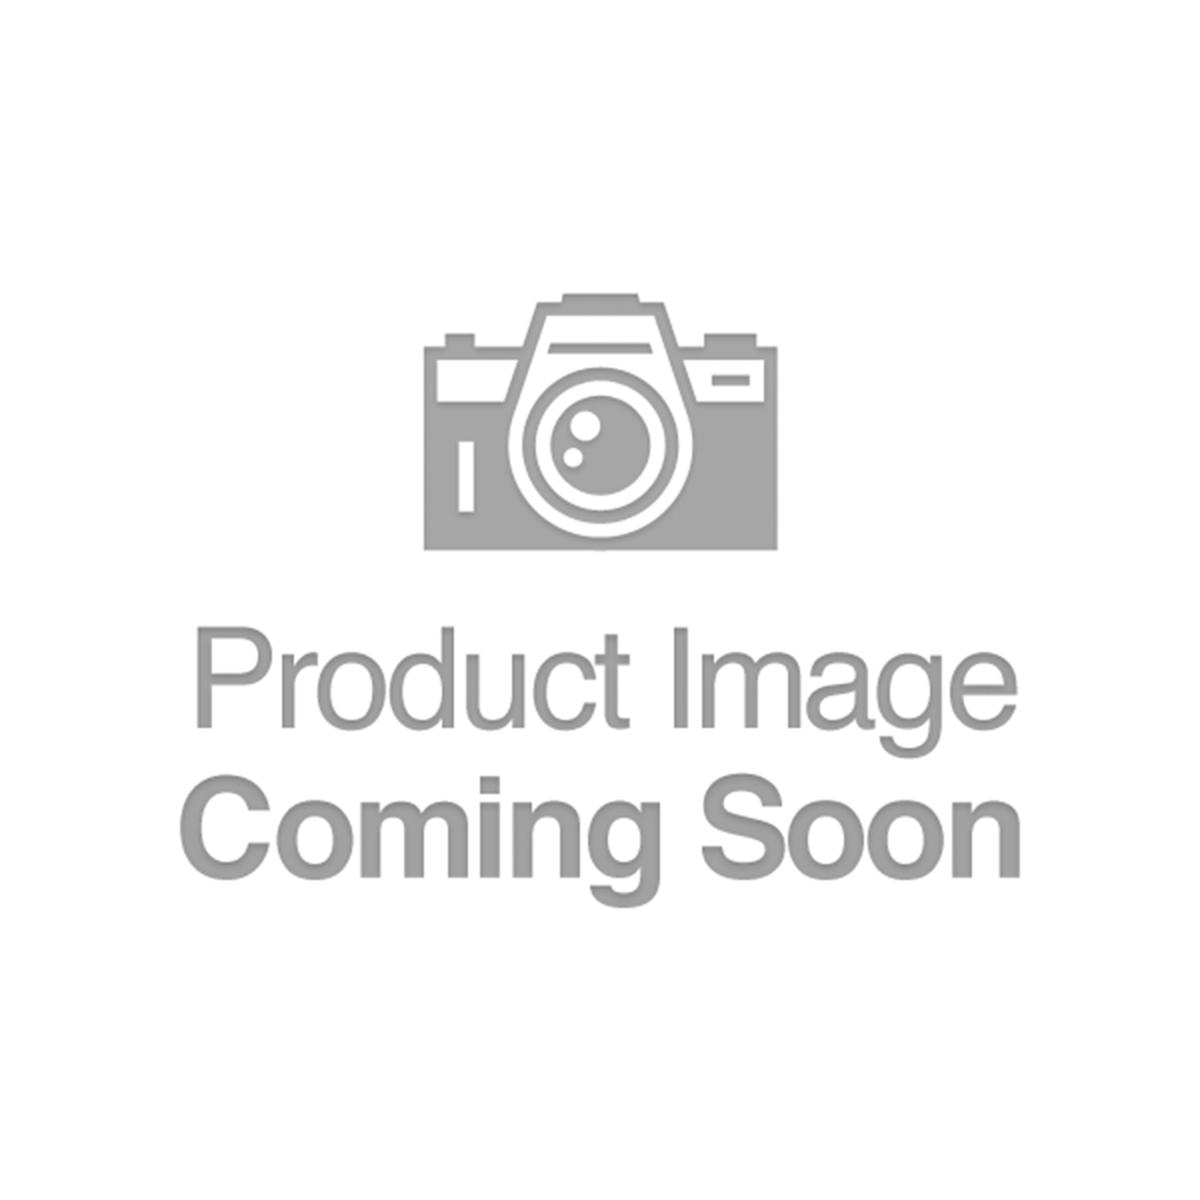 Elizabethville - Pennsylvania - CH 5563 - FR 545 - PMG Very Fine 30